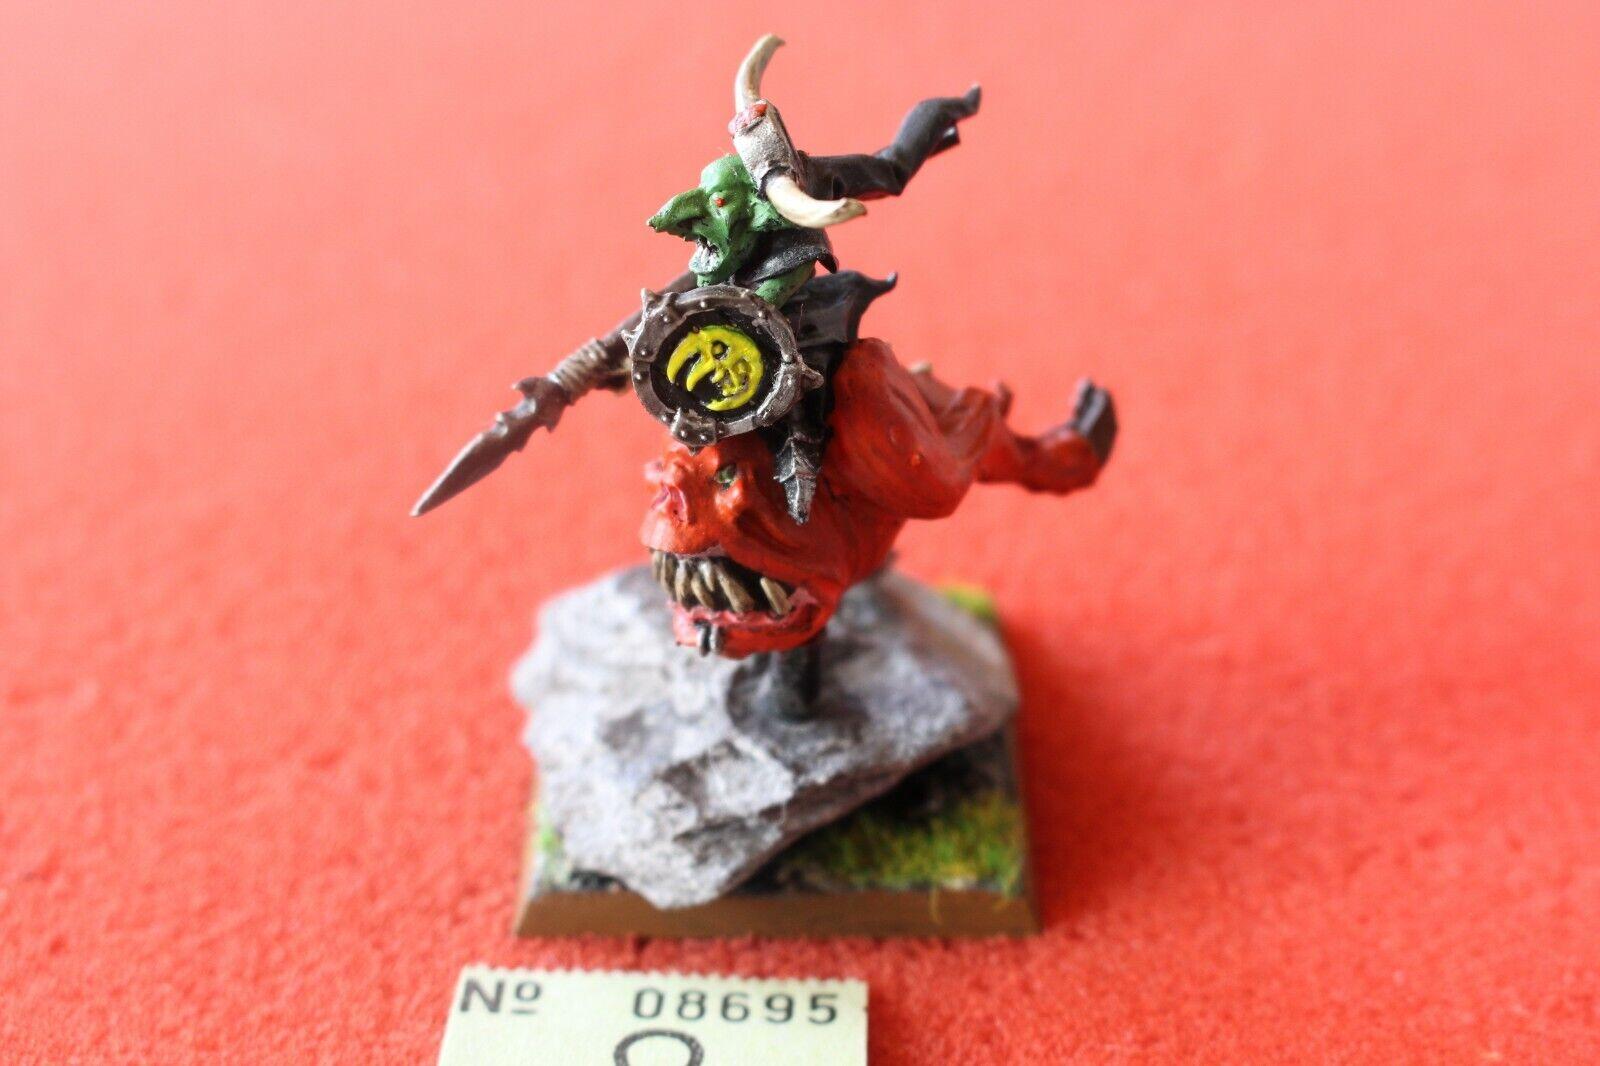 Juegos taller Warhammer Night Goblin gloomspite Gitz Loon Boss en Squig gigante